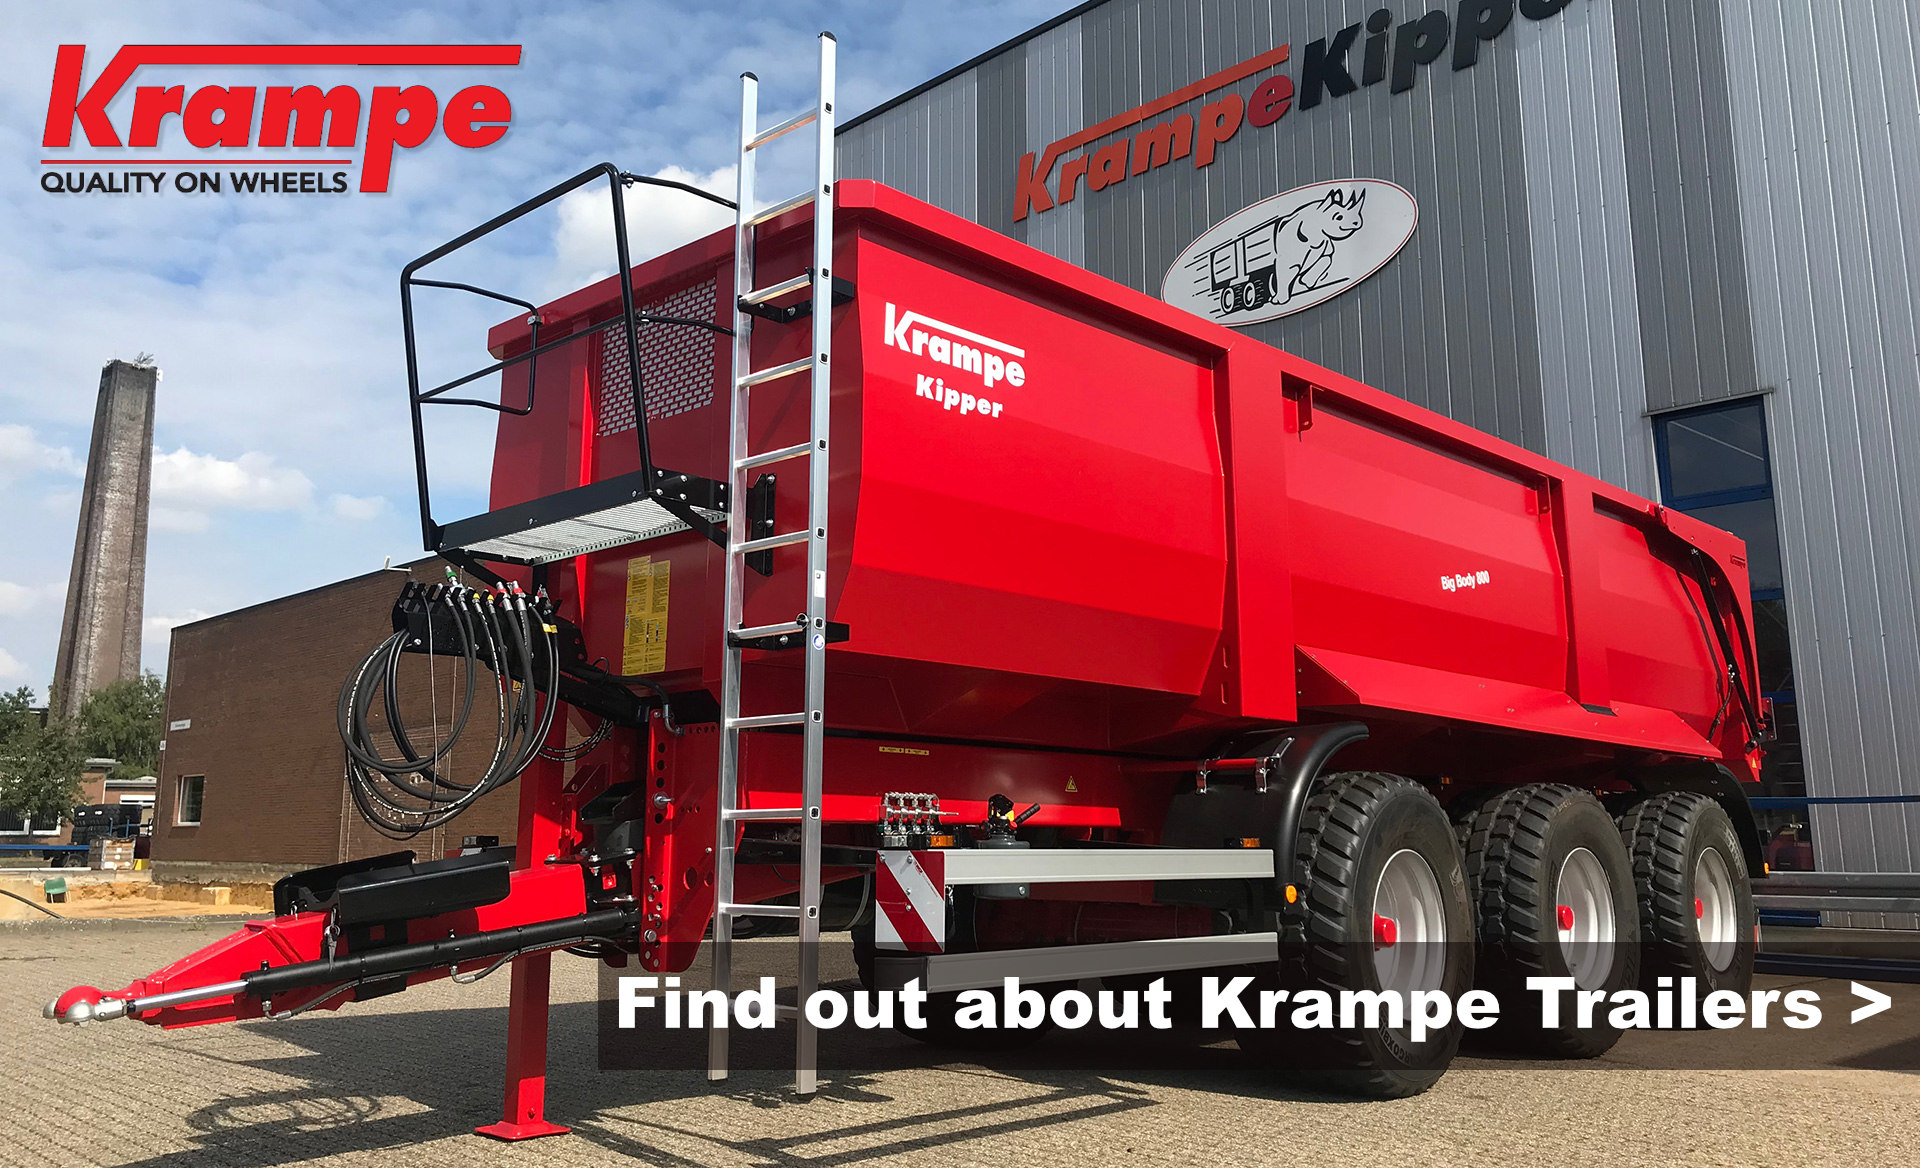 Krampe big body 800 link to page for full information